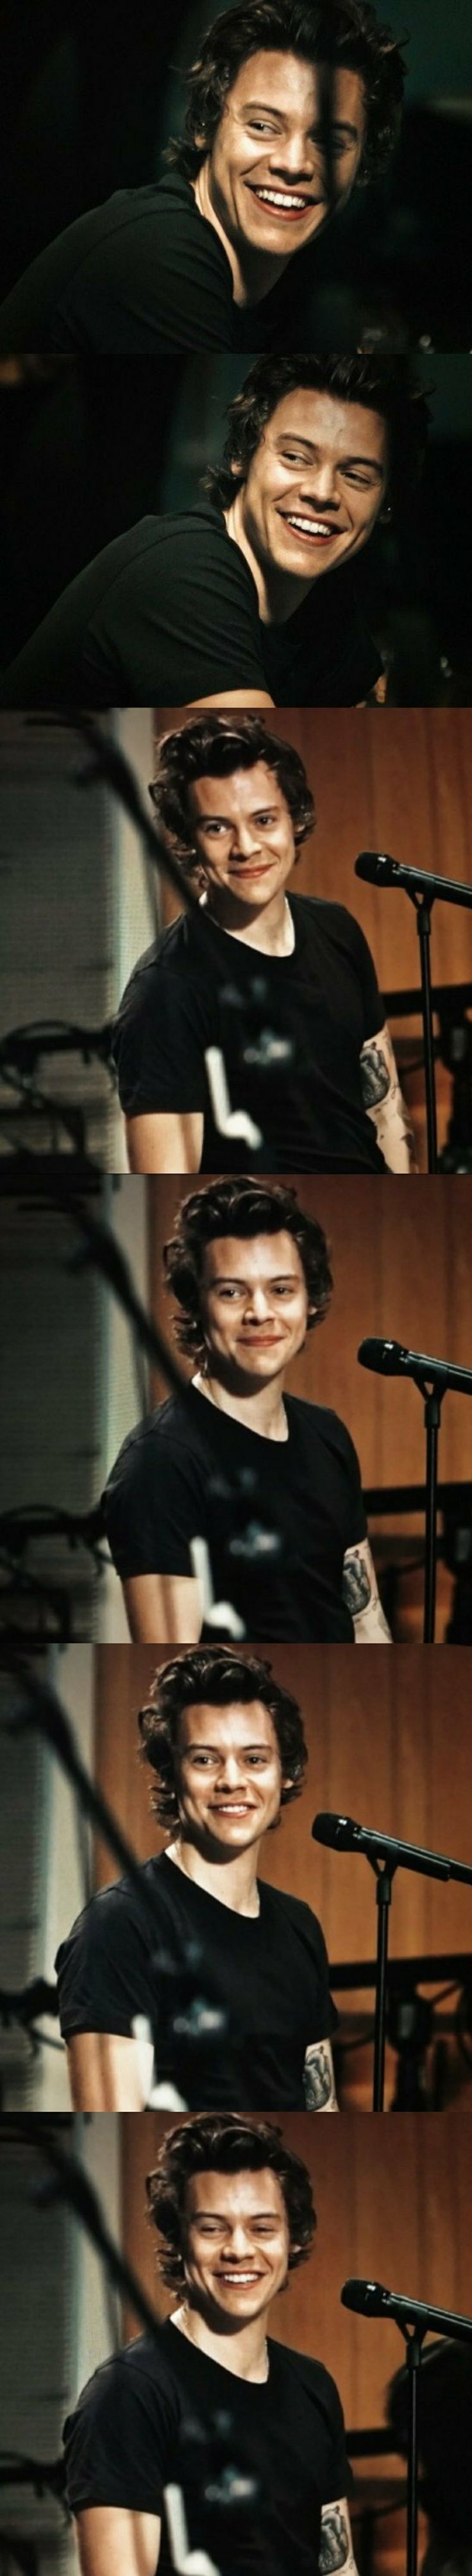 Harry Styles ♥️♥️